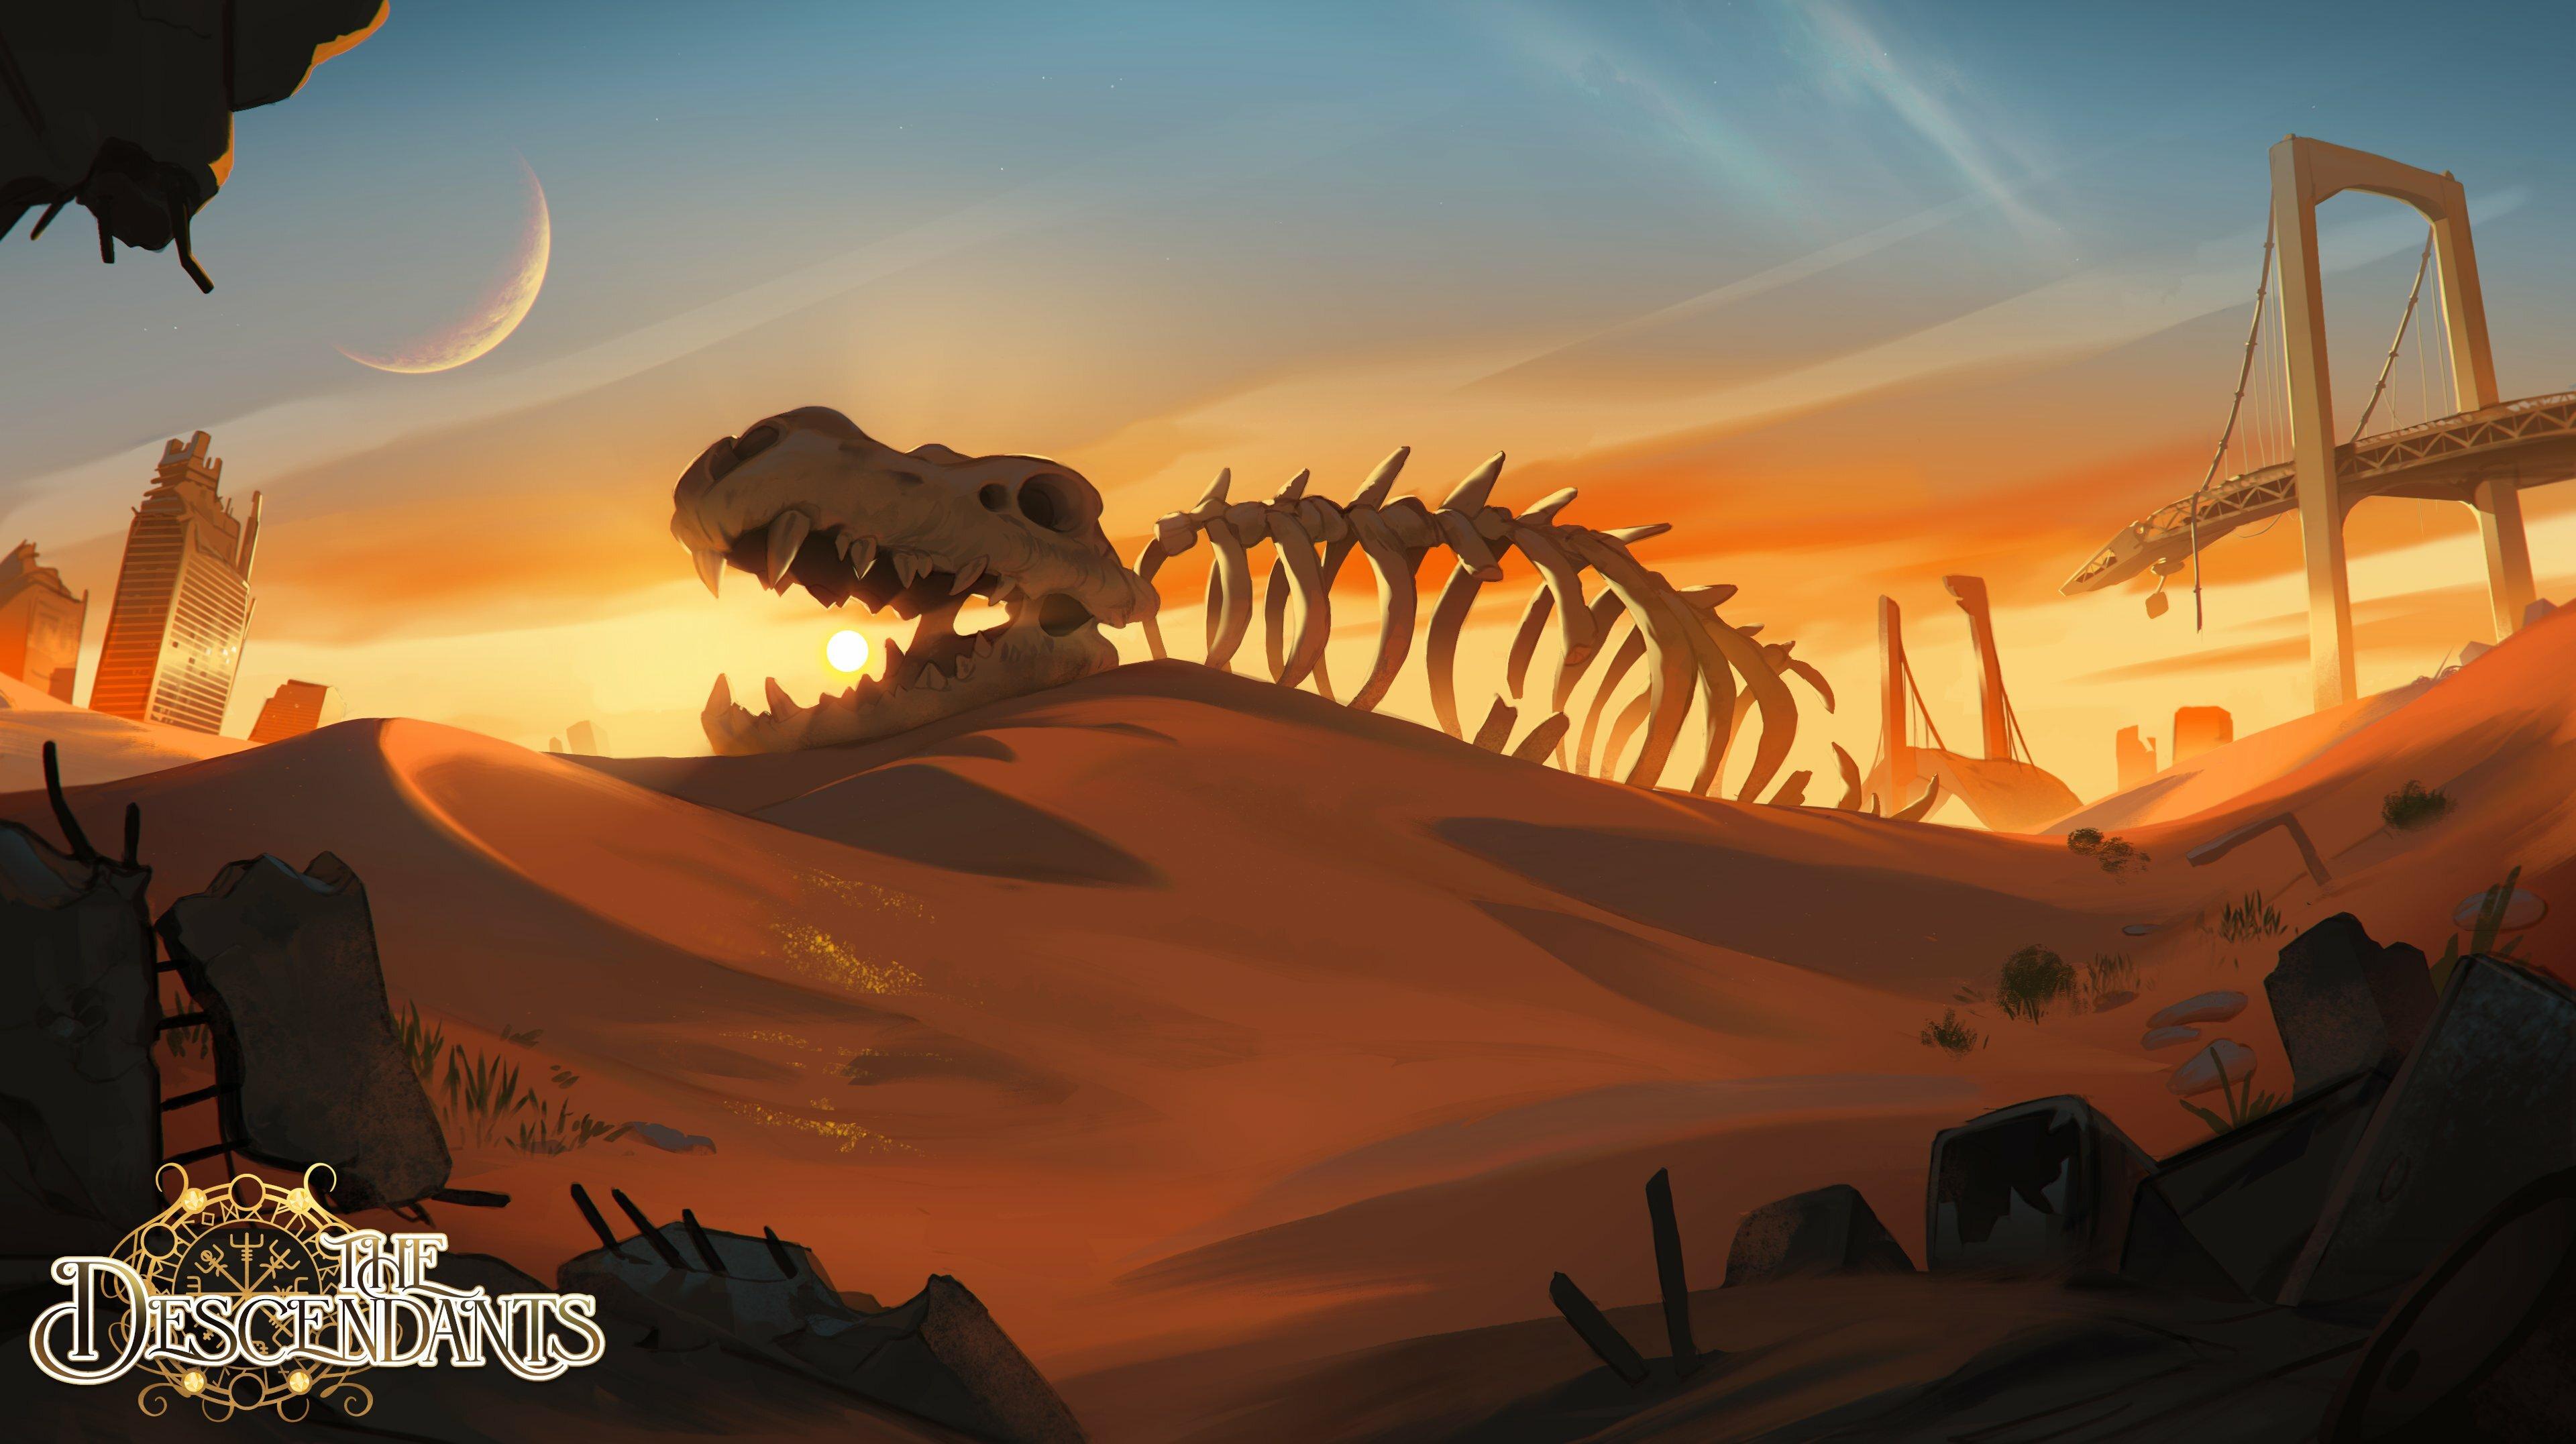 The Descendants - Wasteland